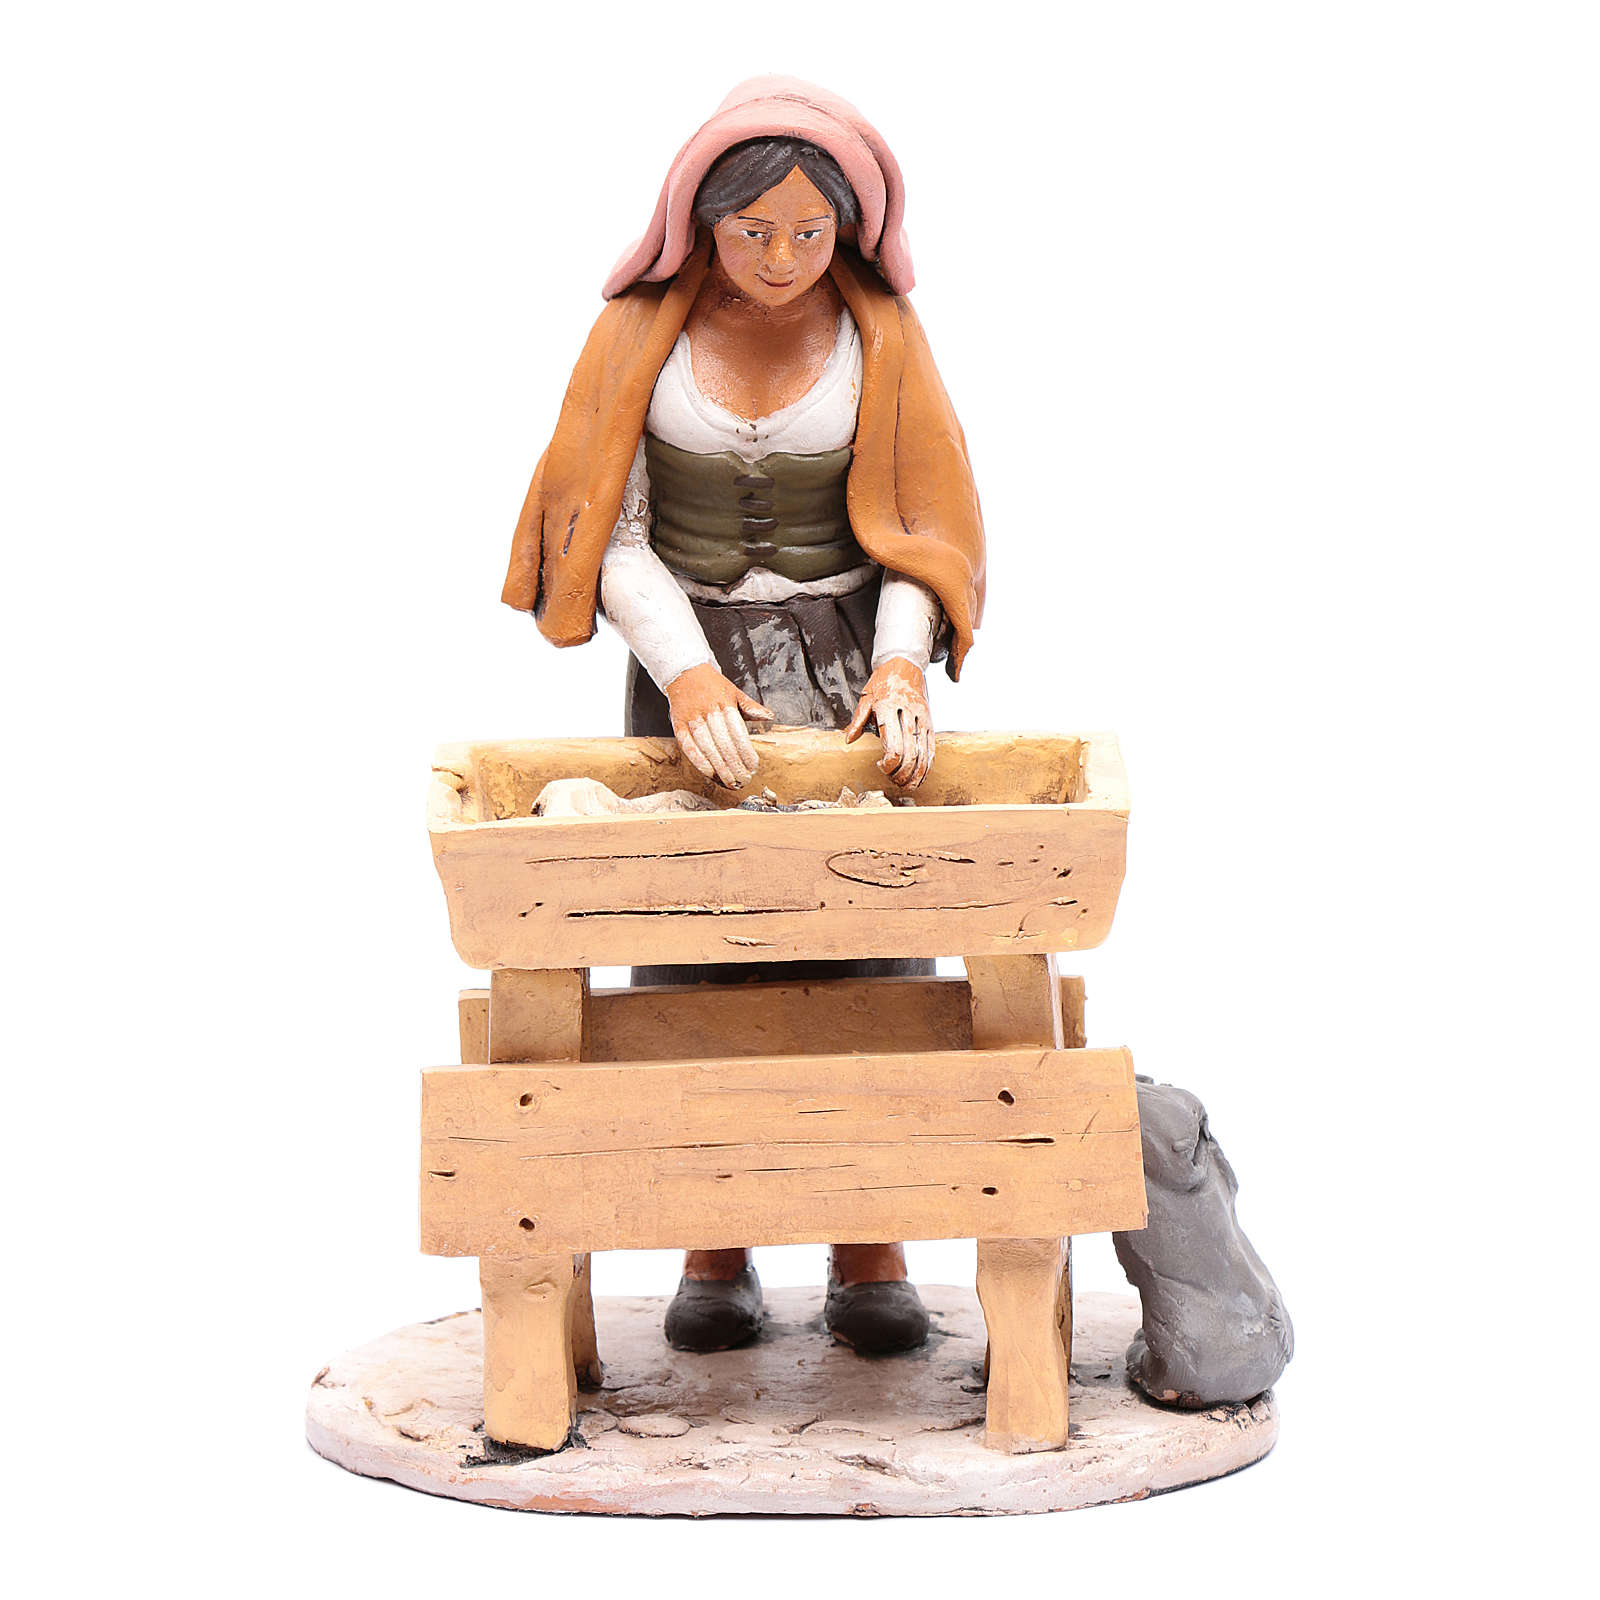 Donna che impasta in terracotta presepe Deruta 30 cm 4